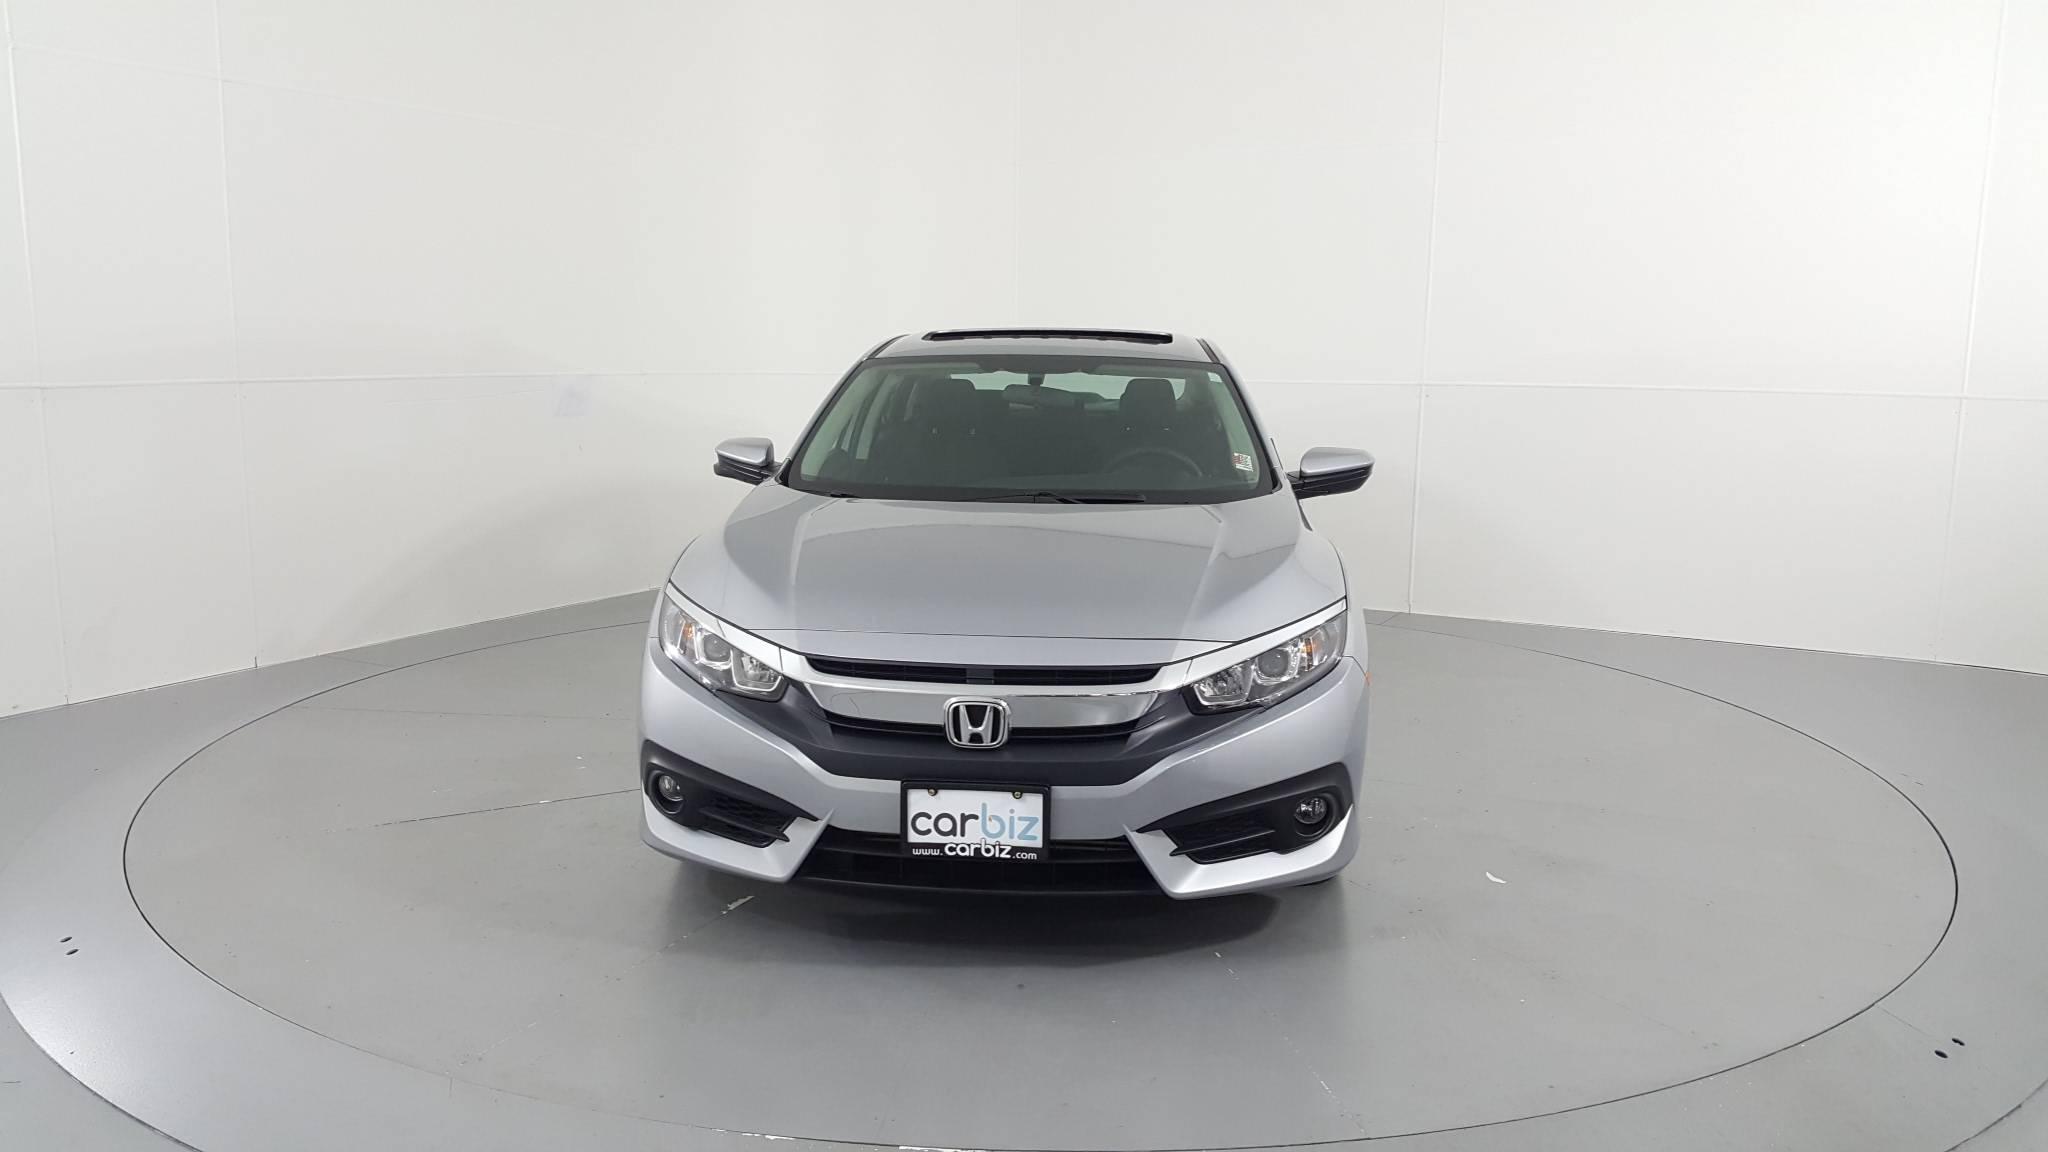 Pre-Owned 2016 Honda Civic Sedan EX-T